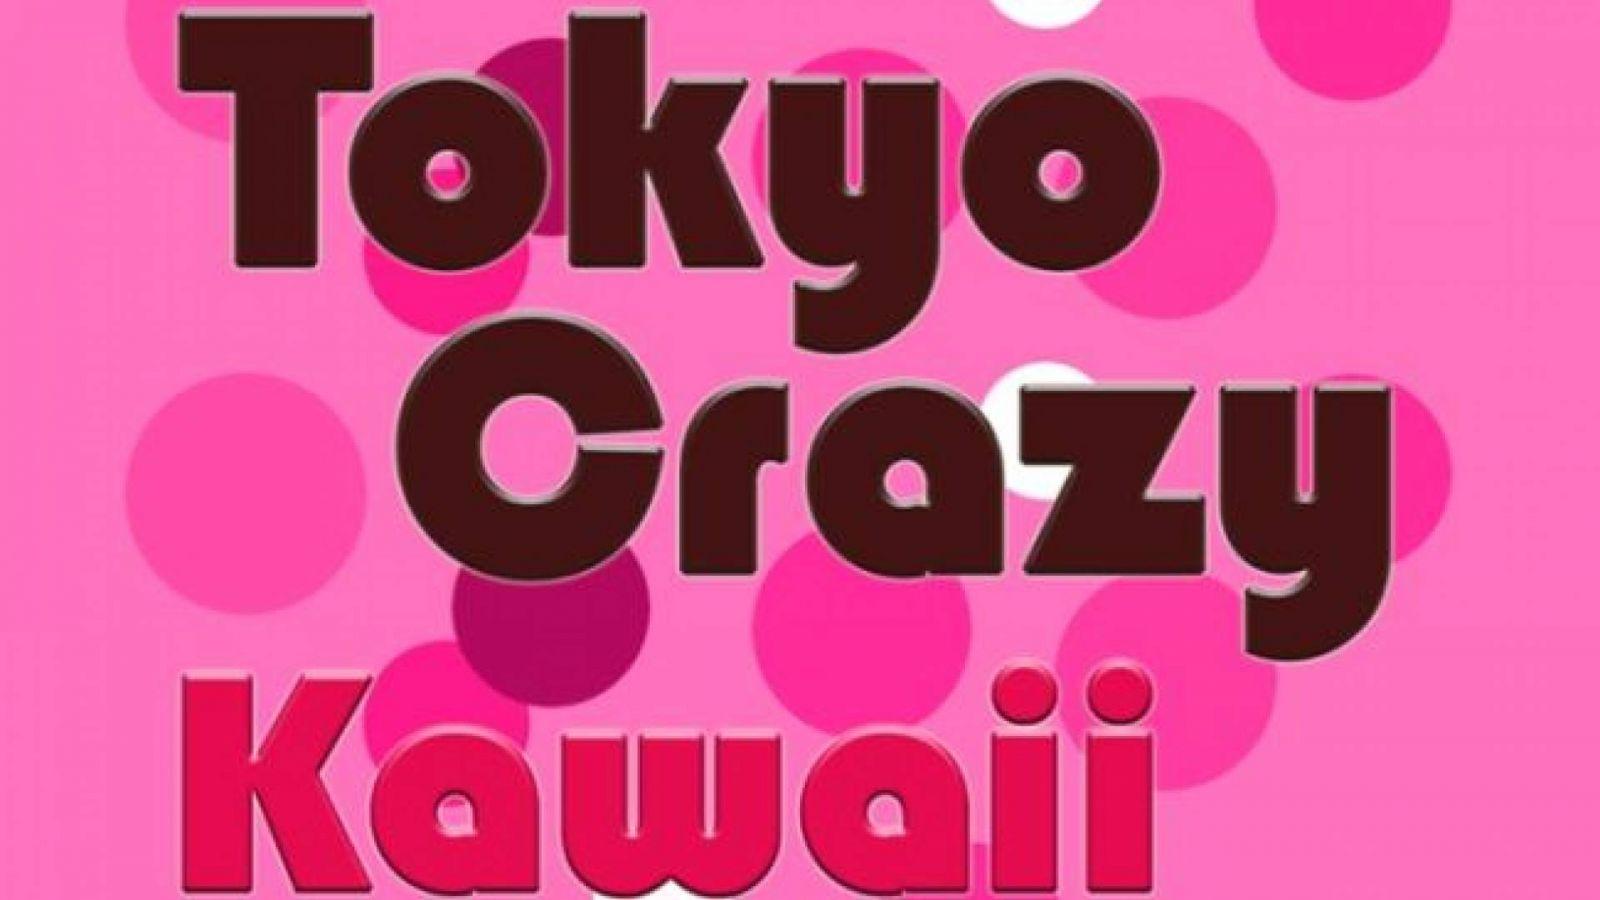 Tokyo Crazy Kawaii Paris © Tokyo Crazy Kawaii Paris